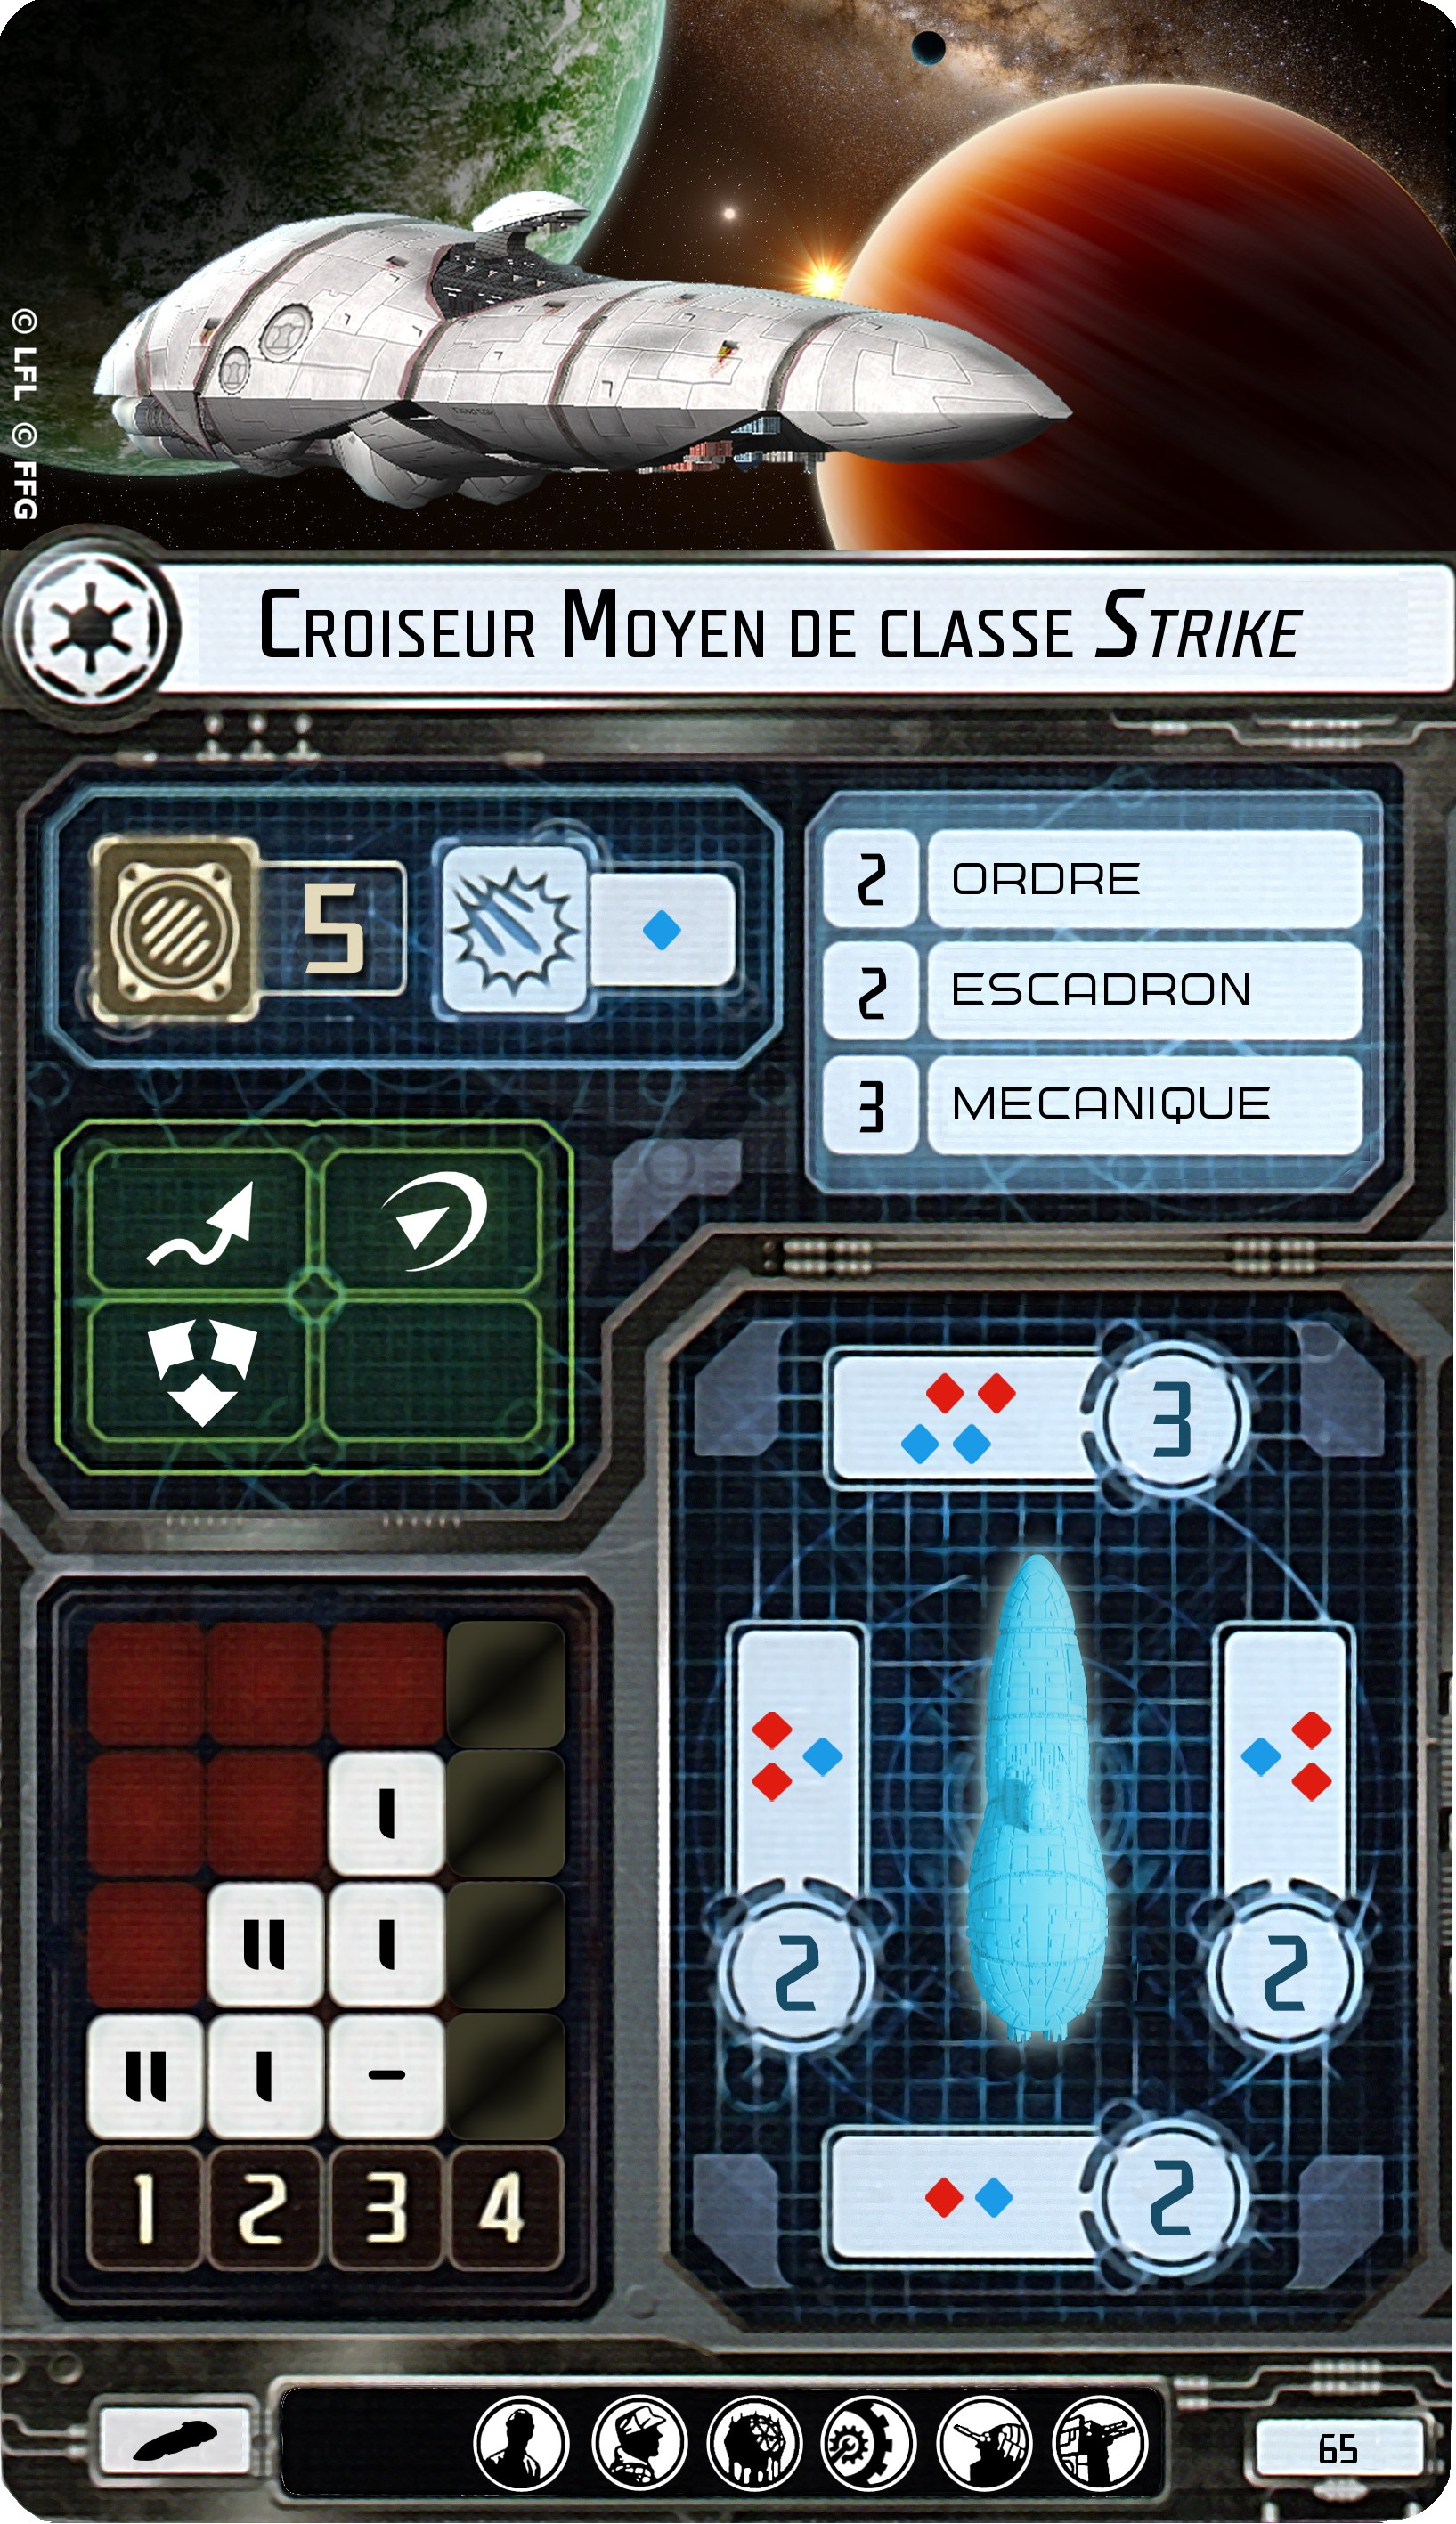 Croiseur de classe Strike